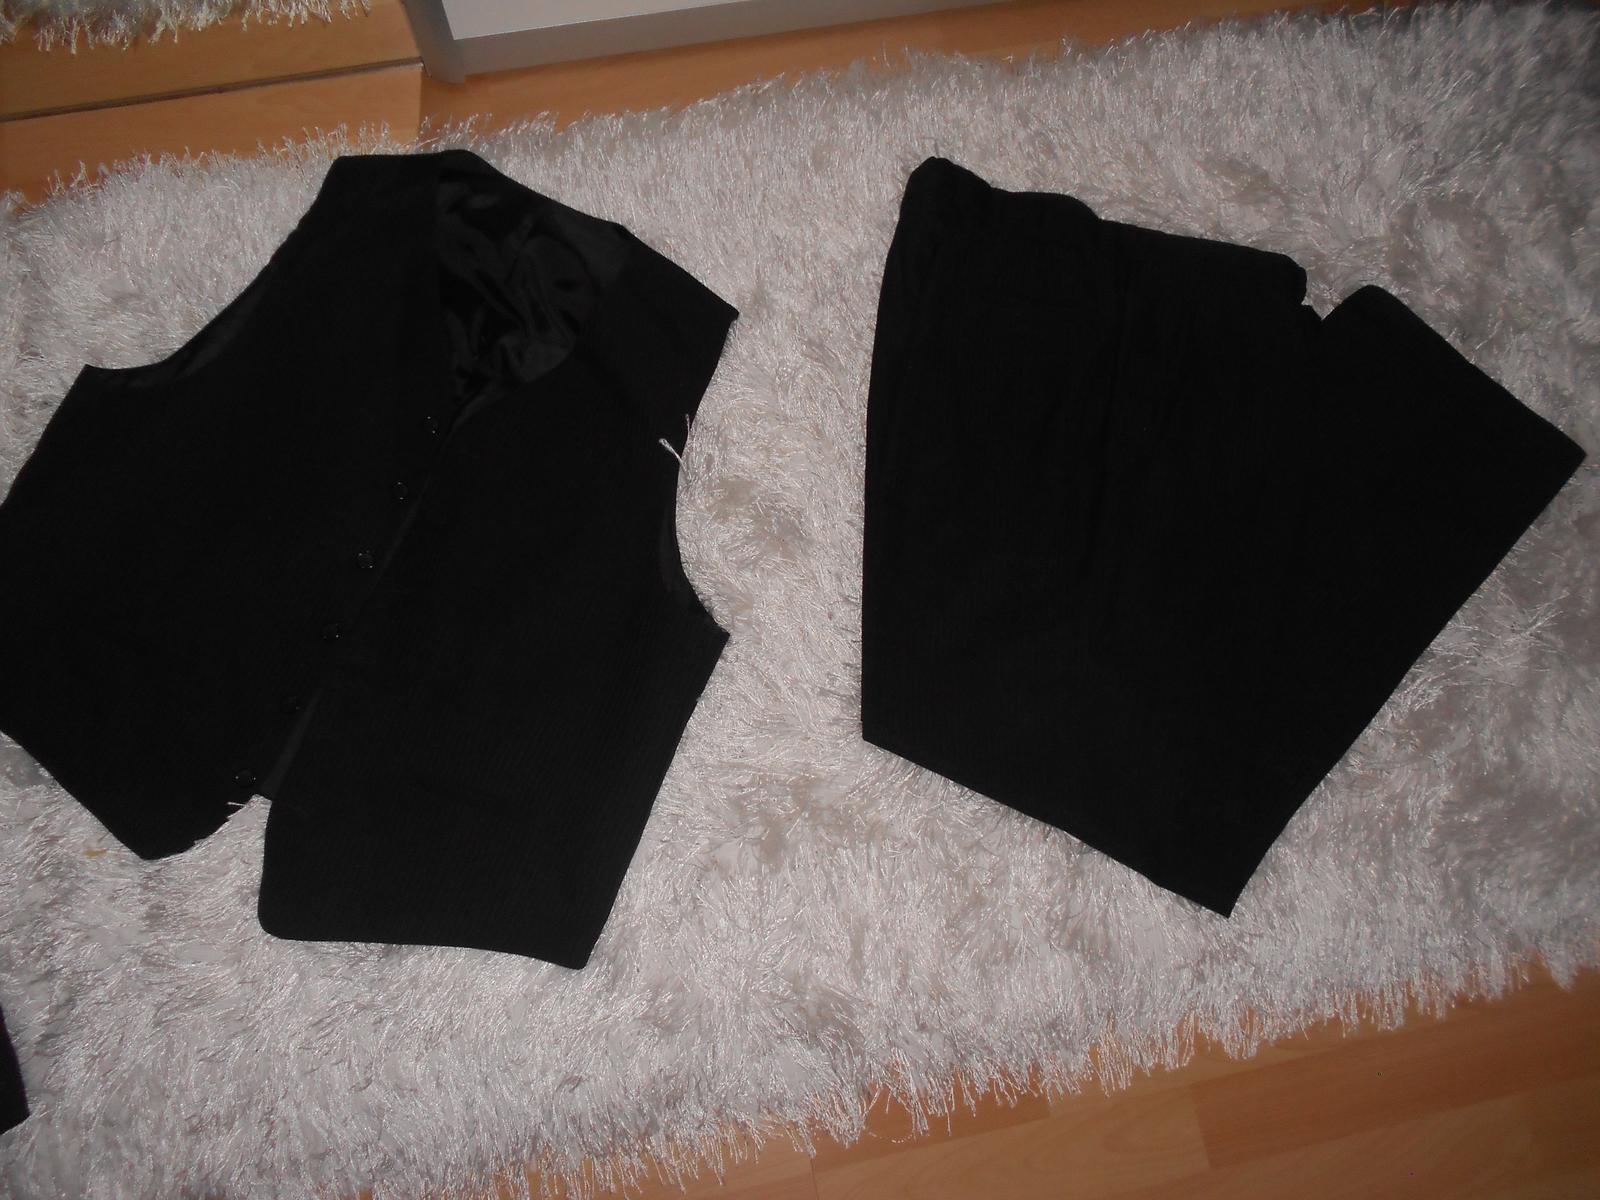 Oblek čierny + 2ks košele a kravaty gratis - Obrázok č. 3